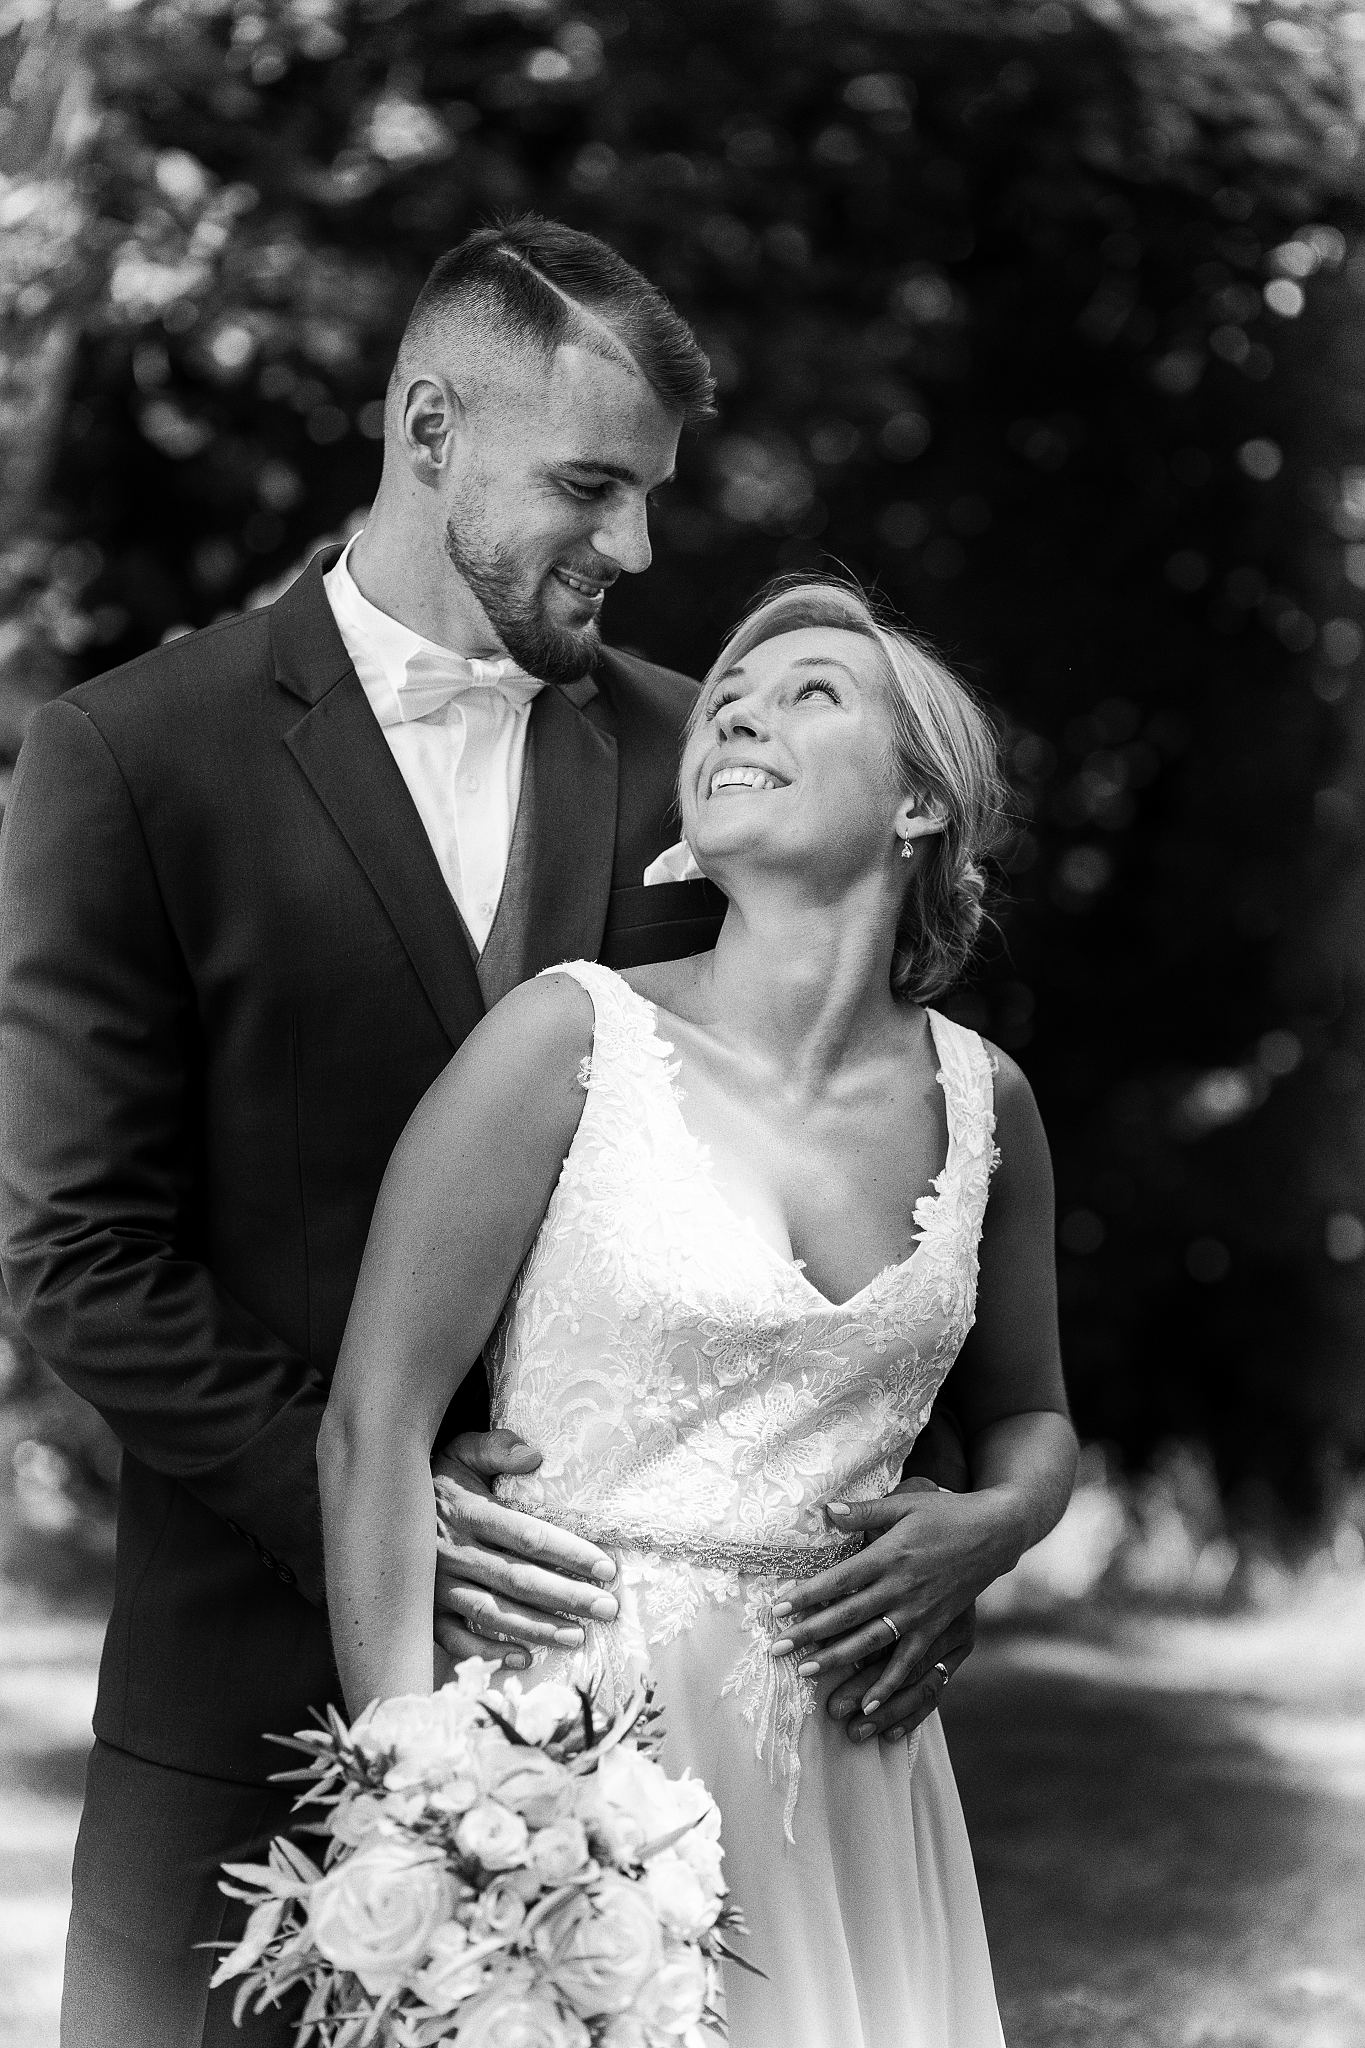 #svatba2020 #svatbaklaraajan #lepeskamiroslav @lepeskamiroslav